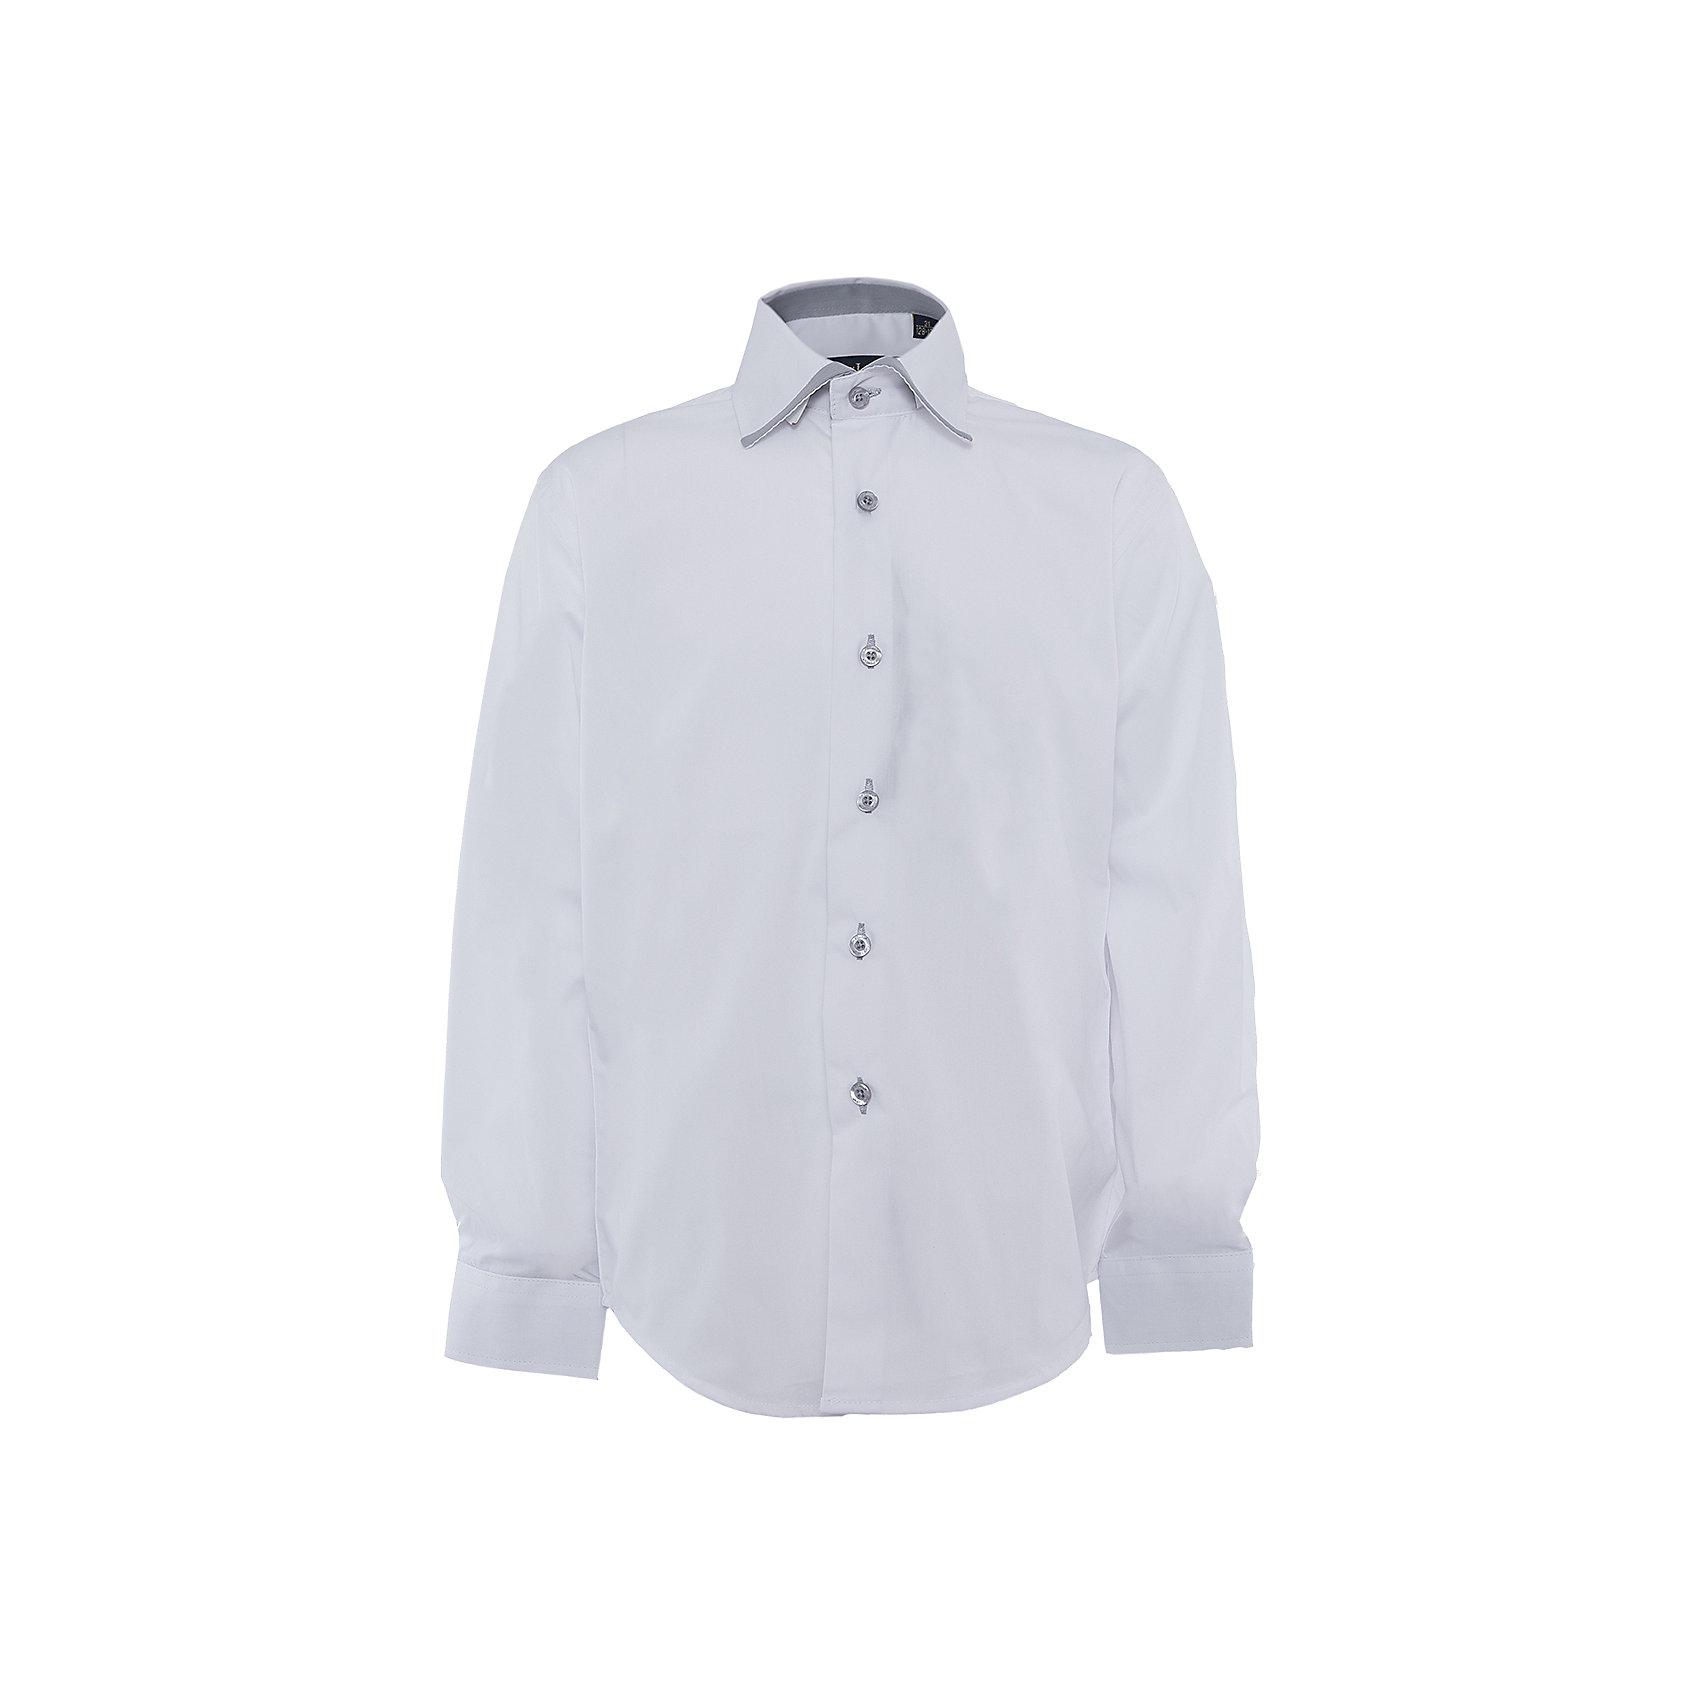 Рубашка для мальчика PREMIUM SkylakeБлузки и рубашки<br>Рубашка для мальчика PREMIUM от известного бренда Skylake<br>Состав:<br>80%хлопок 20%п/э<br><br>Ширина мм: 174<br>Глубина мм: 10<br>Высота мм: 169<br>Вес г: 157<br>Цвет: серый<br>Возраст от месяцев: 144<br>Возраст до месяцев: 156<br>Пол: Мужской<br>Возраст: Детский<br>Размер: 158,146,152,122,128,134,140<br>SKU: 4877759